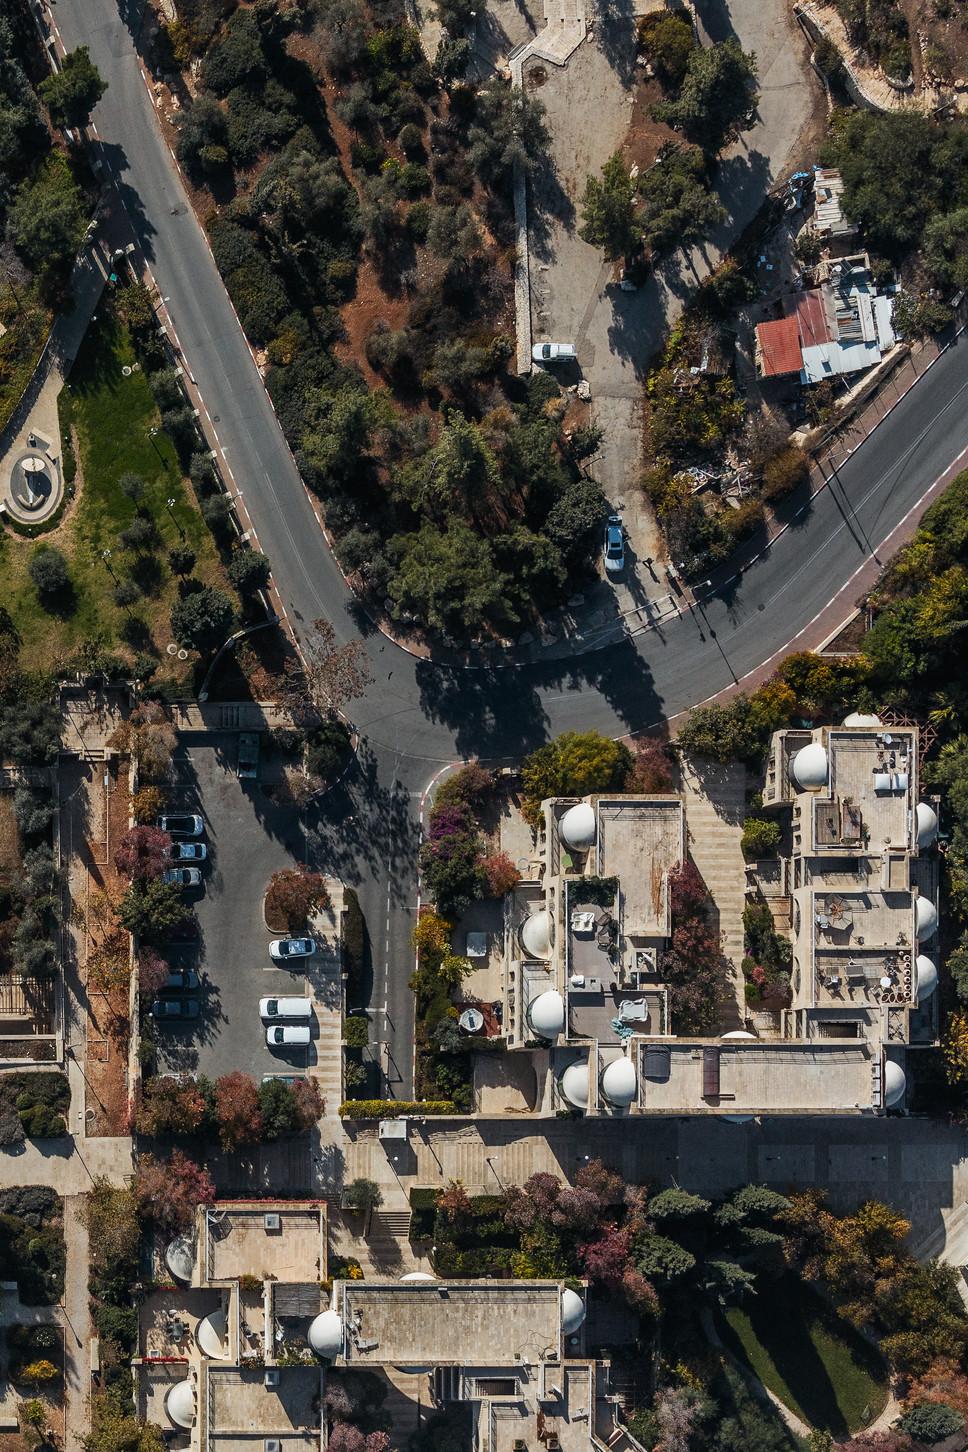 Jerusalem_West_Paul Emile Botta Street 1